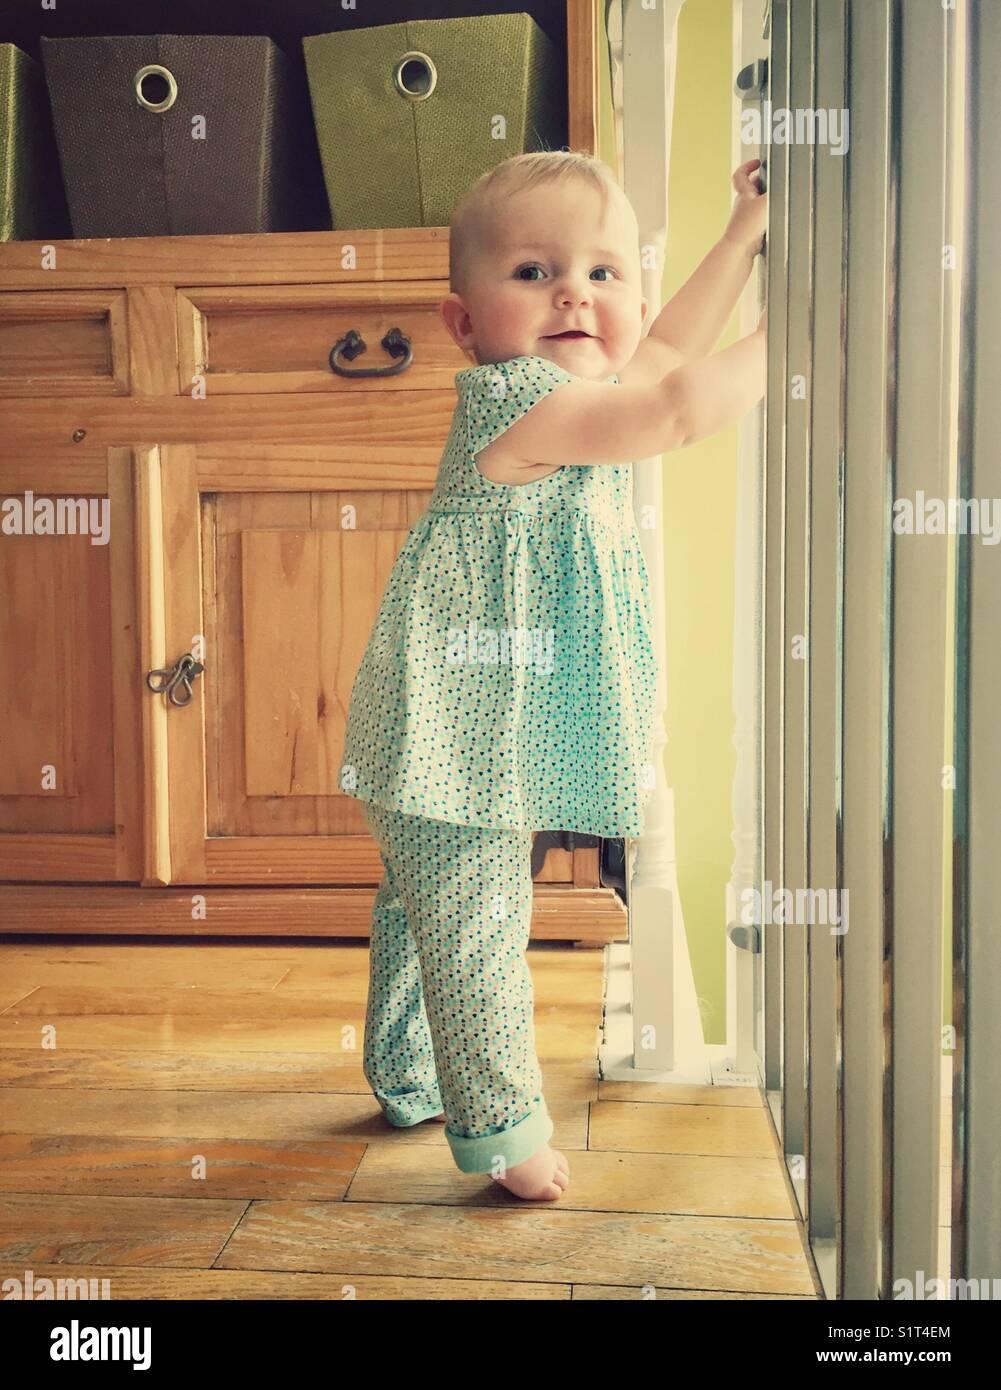 Baby girl cruising along safety gate - Stock Image